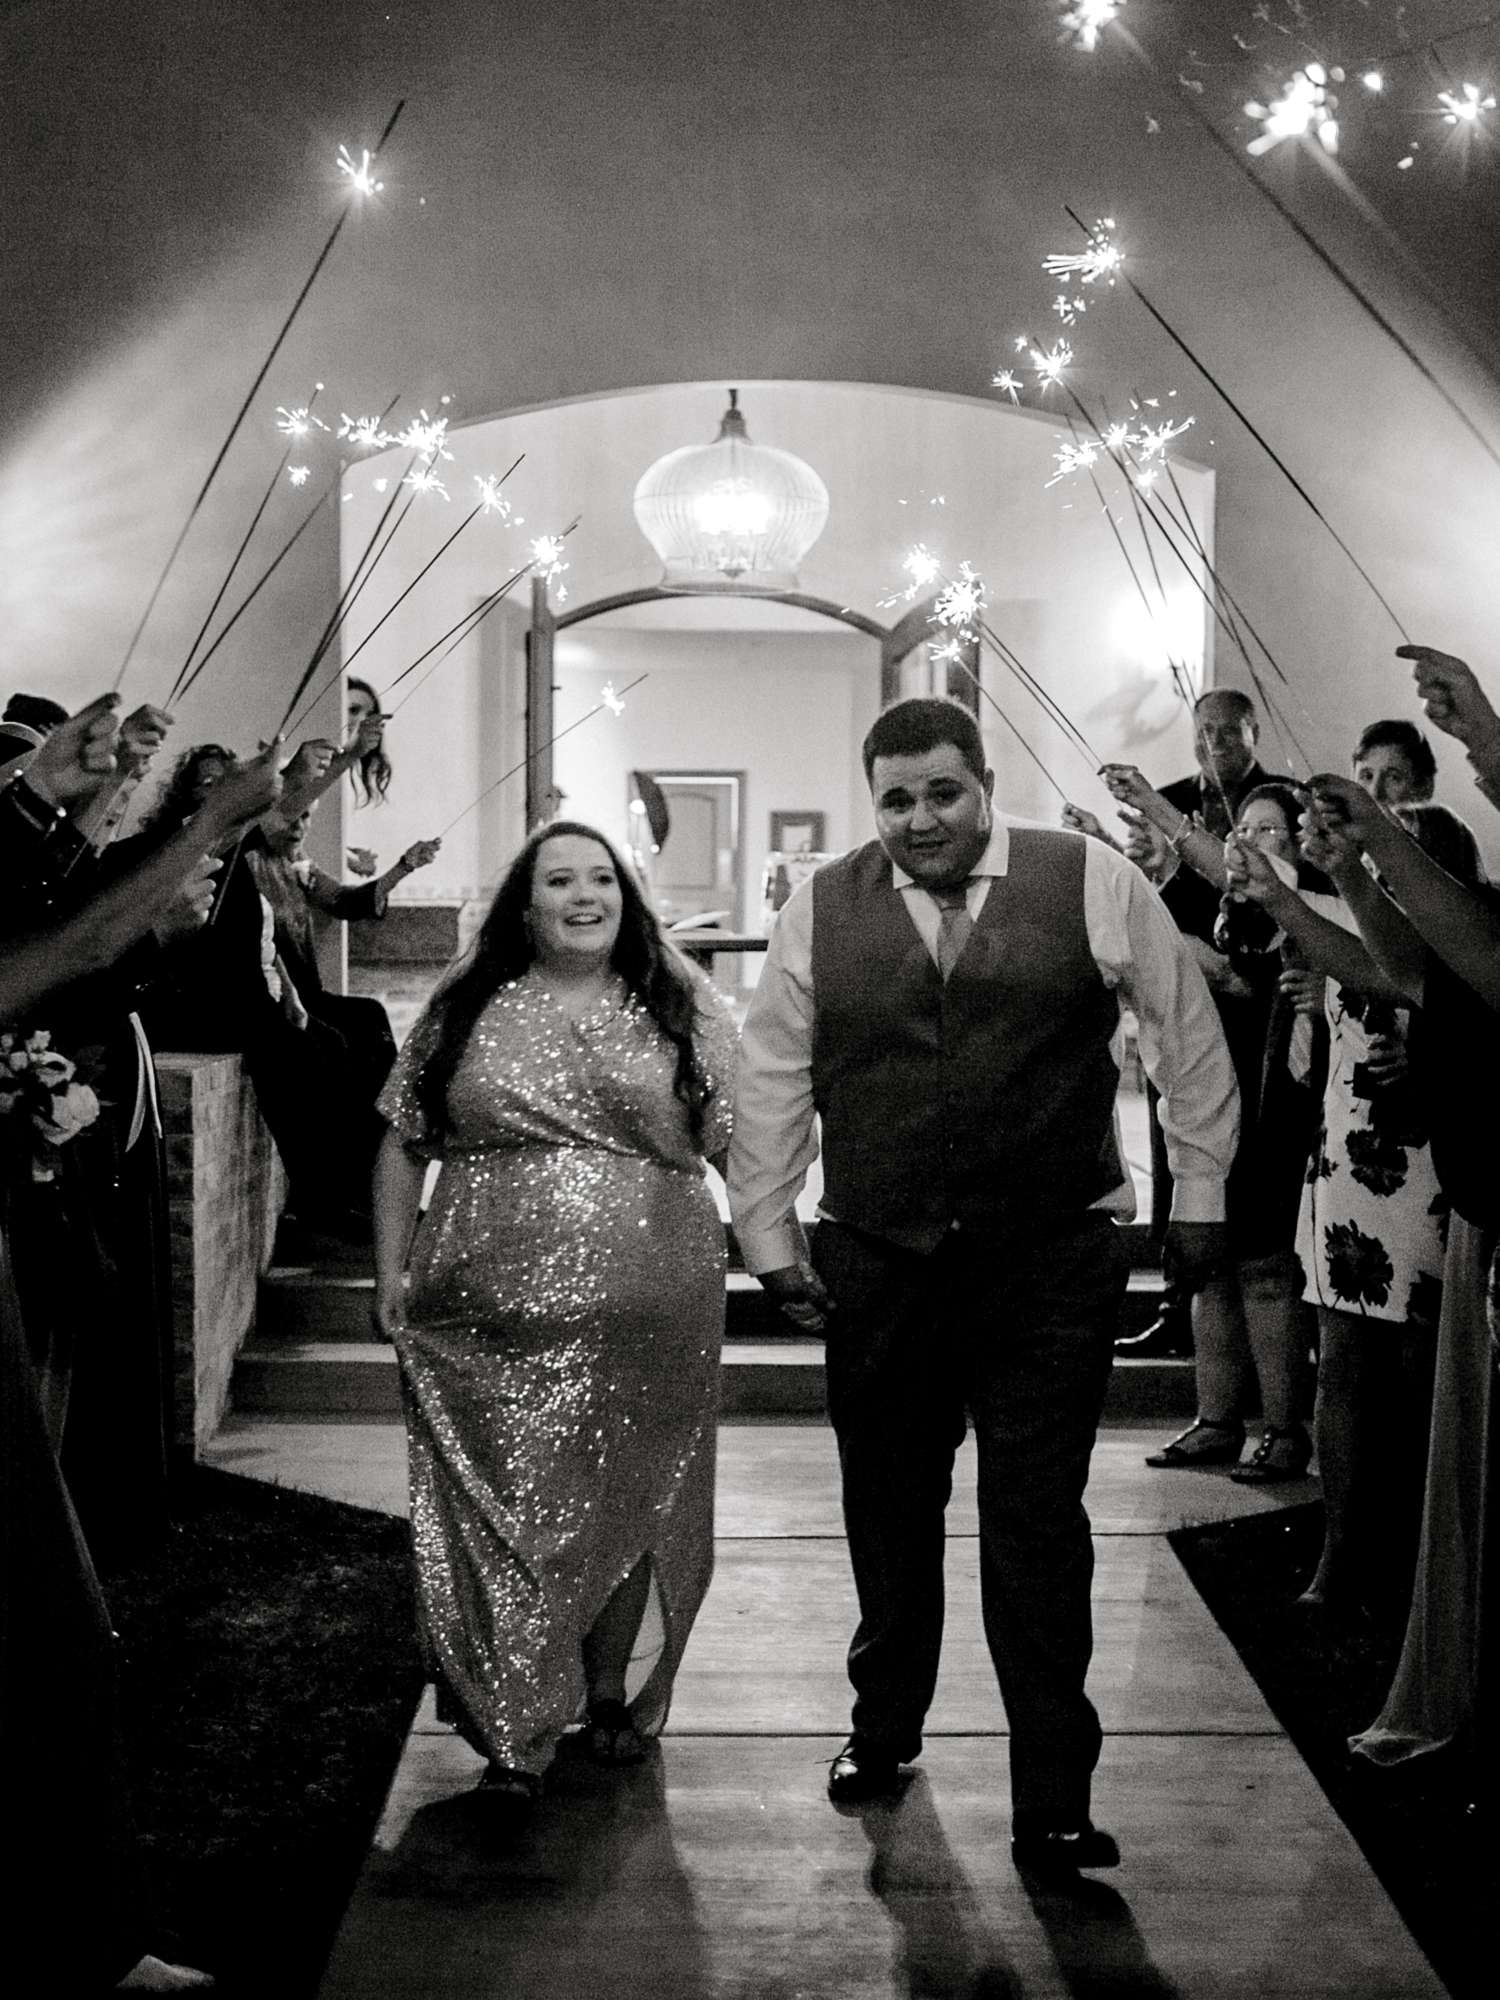 CASSIDY+AND+HARLEY+BRADLEY+EBERLEY+BROOKS+CHAPEL+LUBBOCK+WEDDING+PHOTOGRAPHER+ALLEEJ_0181.jpg